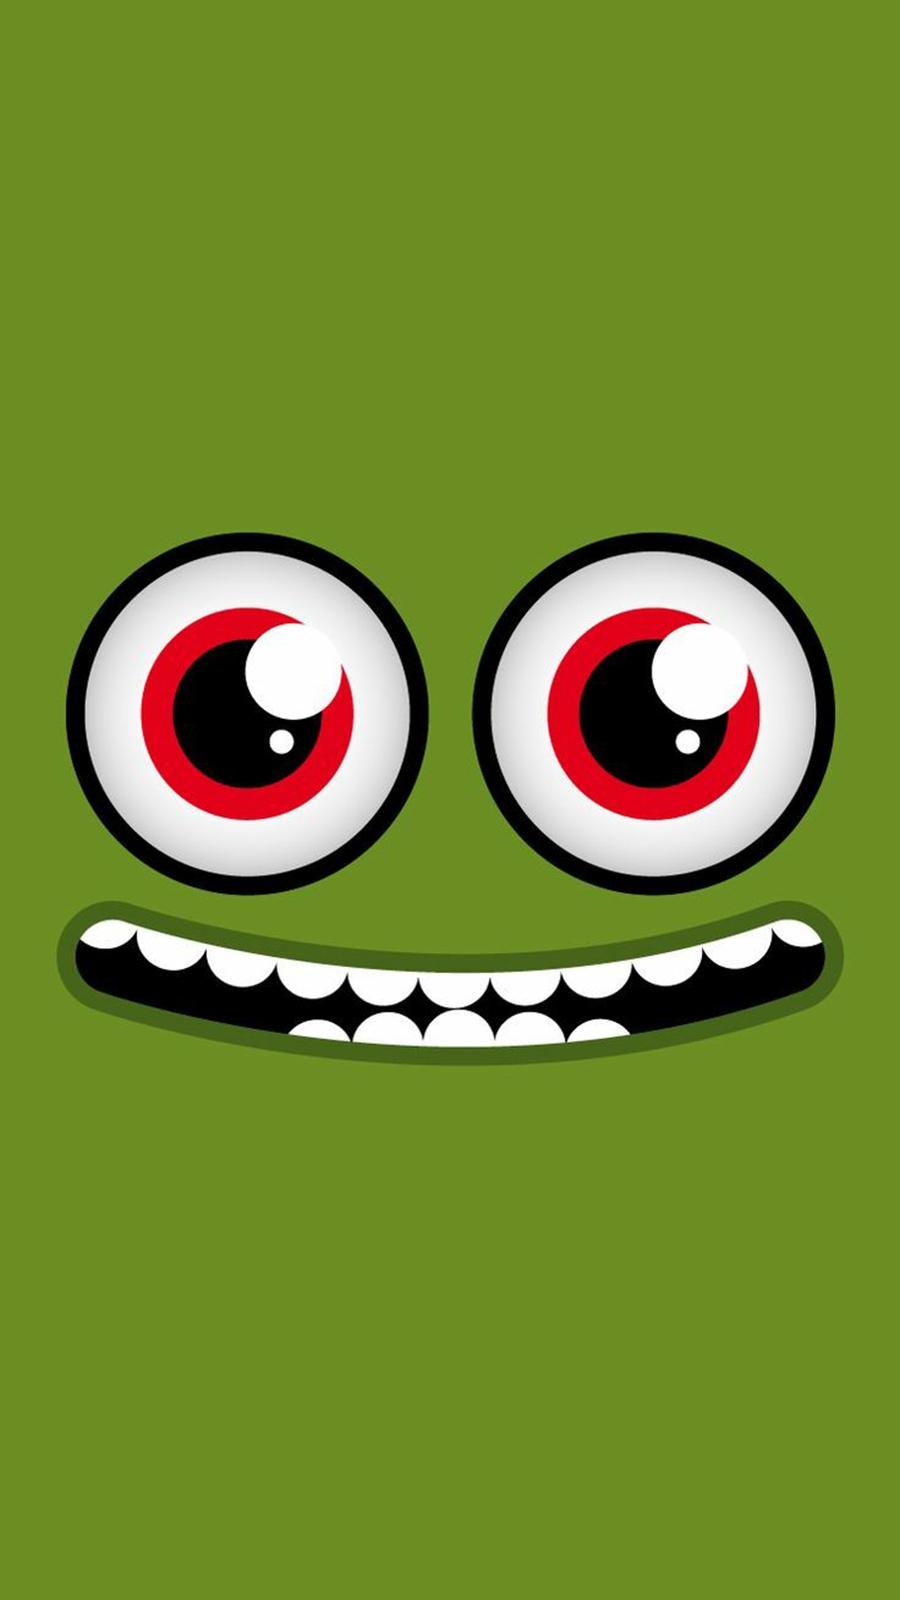 Smile Cartoon Wallpapers Free Download